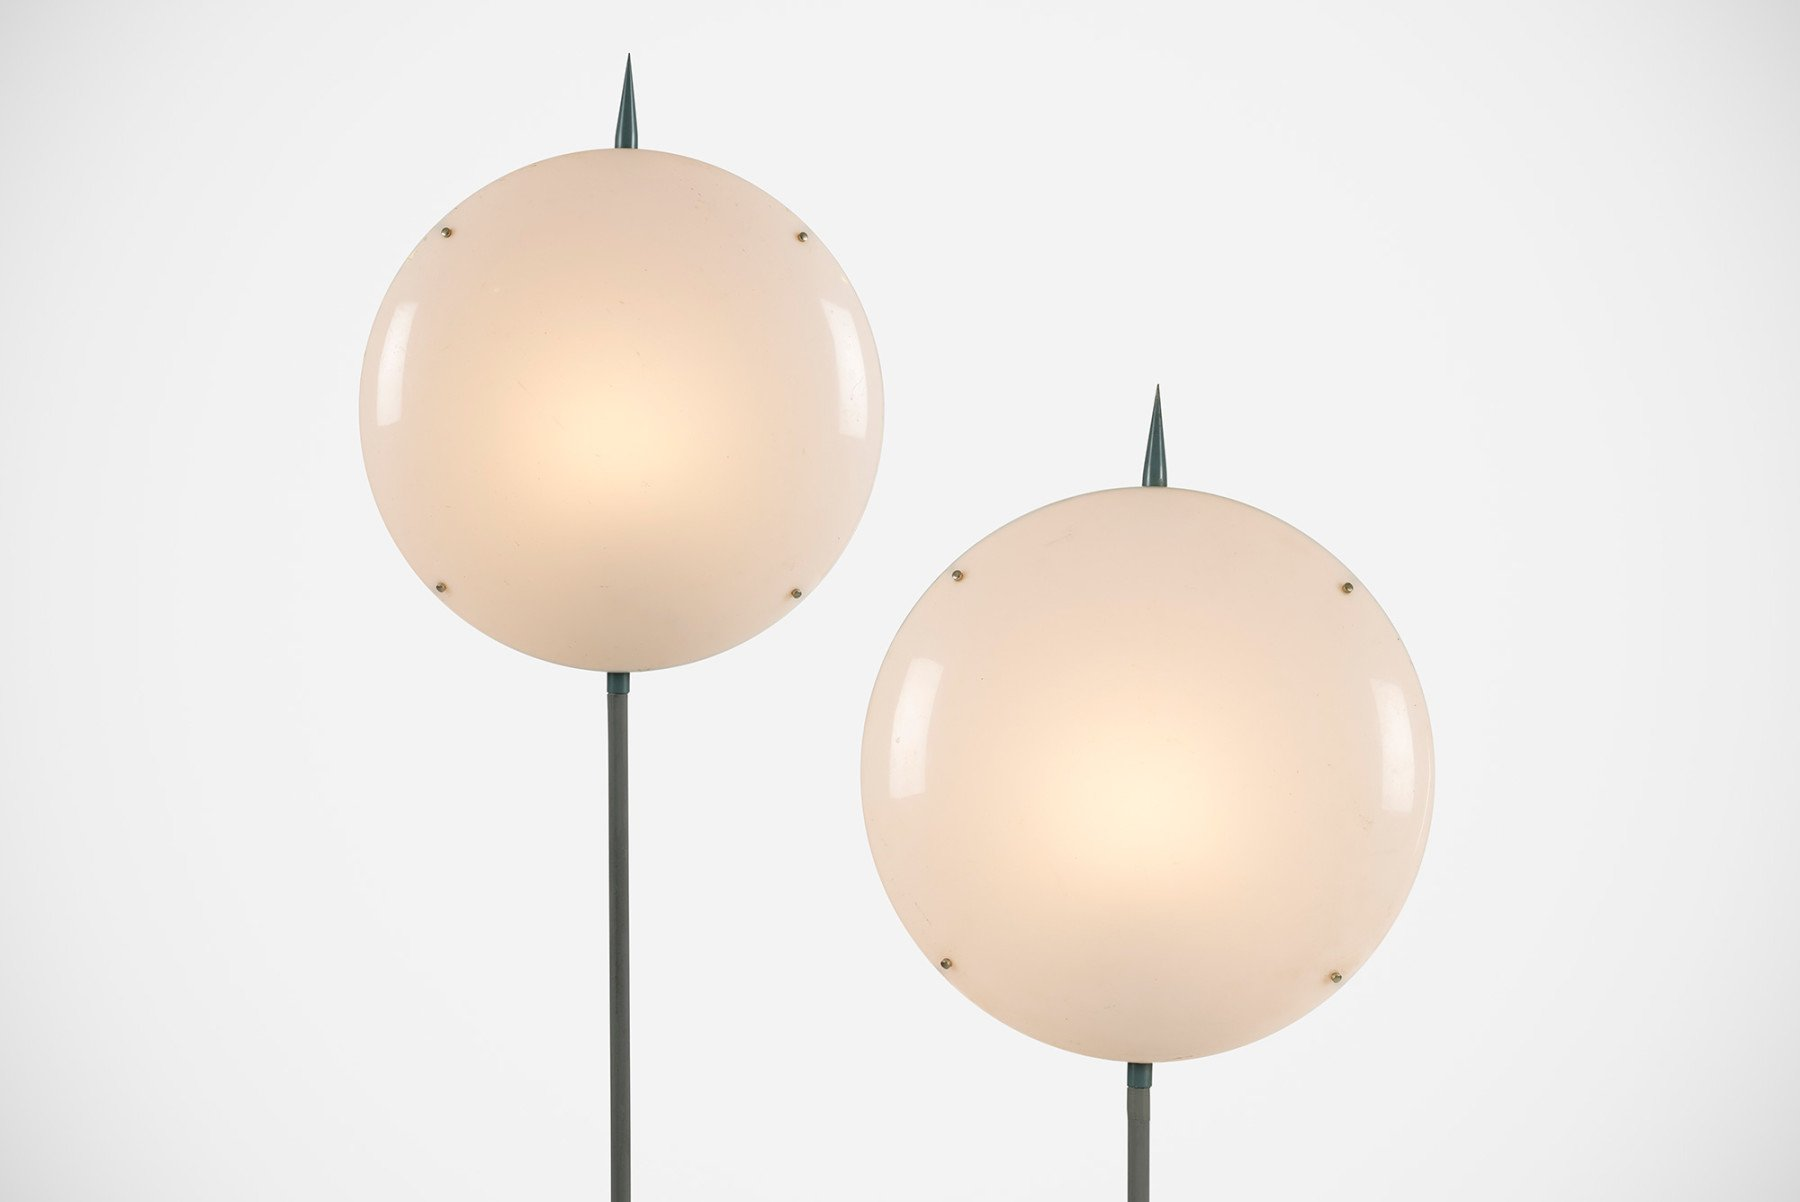 Gio Ponti |   Luna - lamps, from Villa Arreaza, Caracas